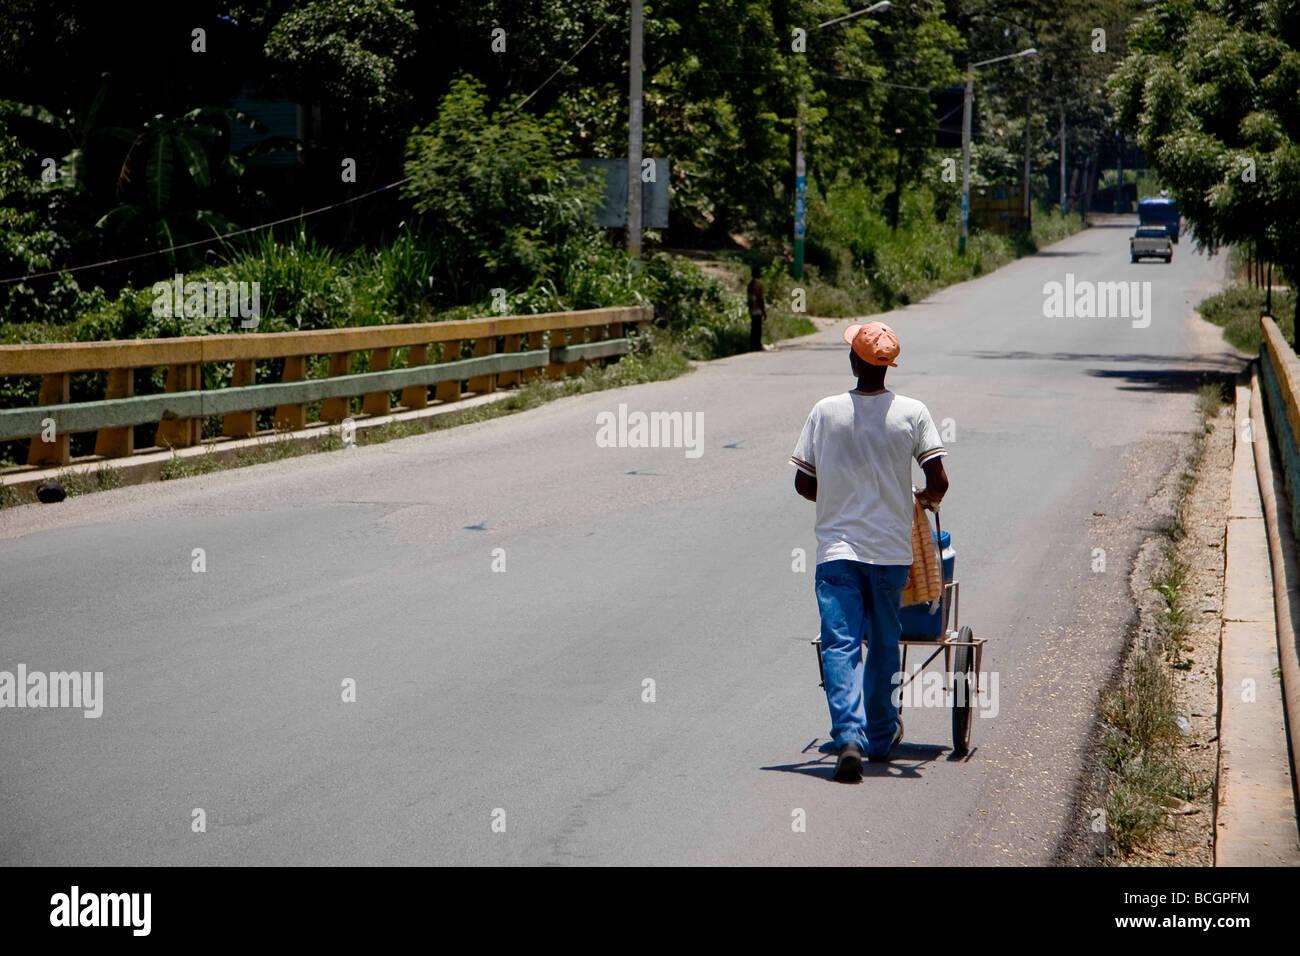 A vendor transports his wares along the road in Santiago Dominican Republic - Stock Image